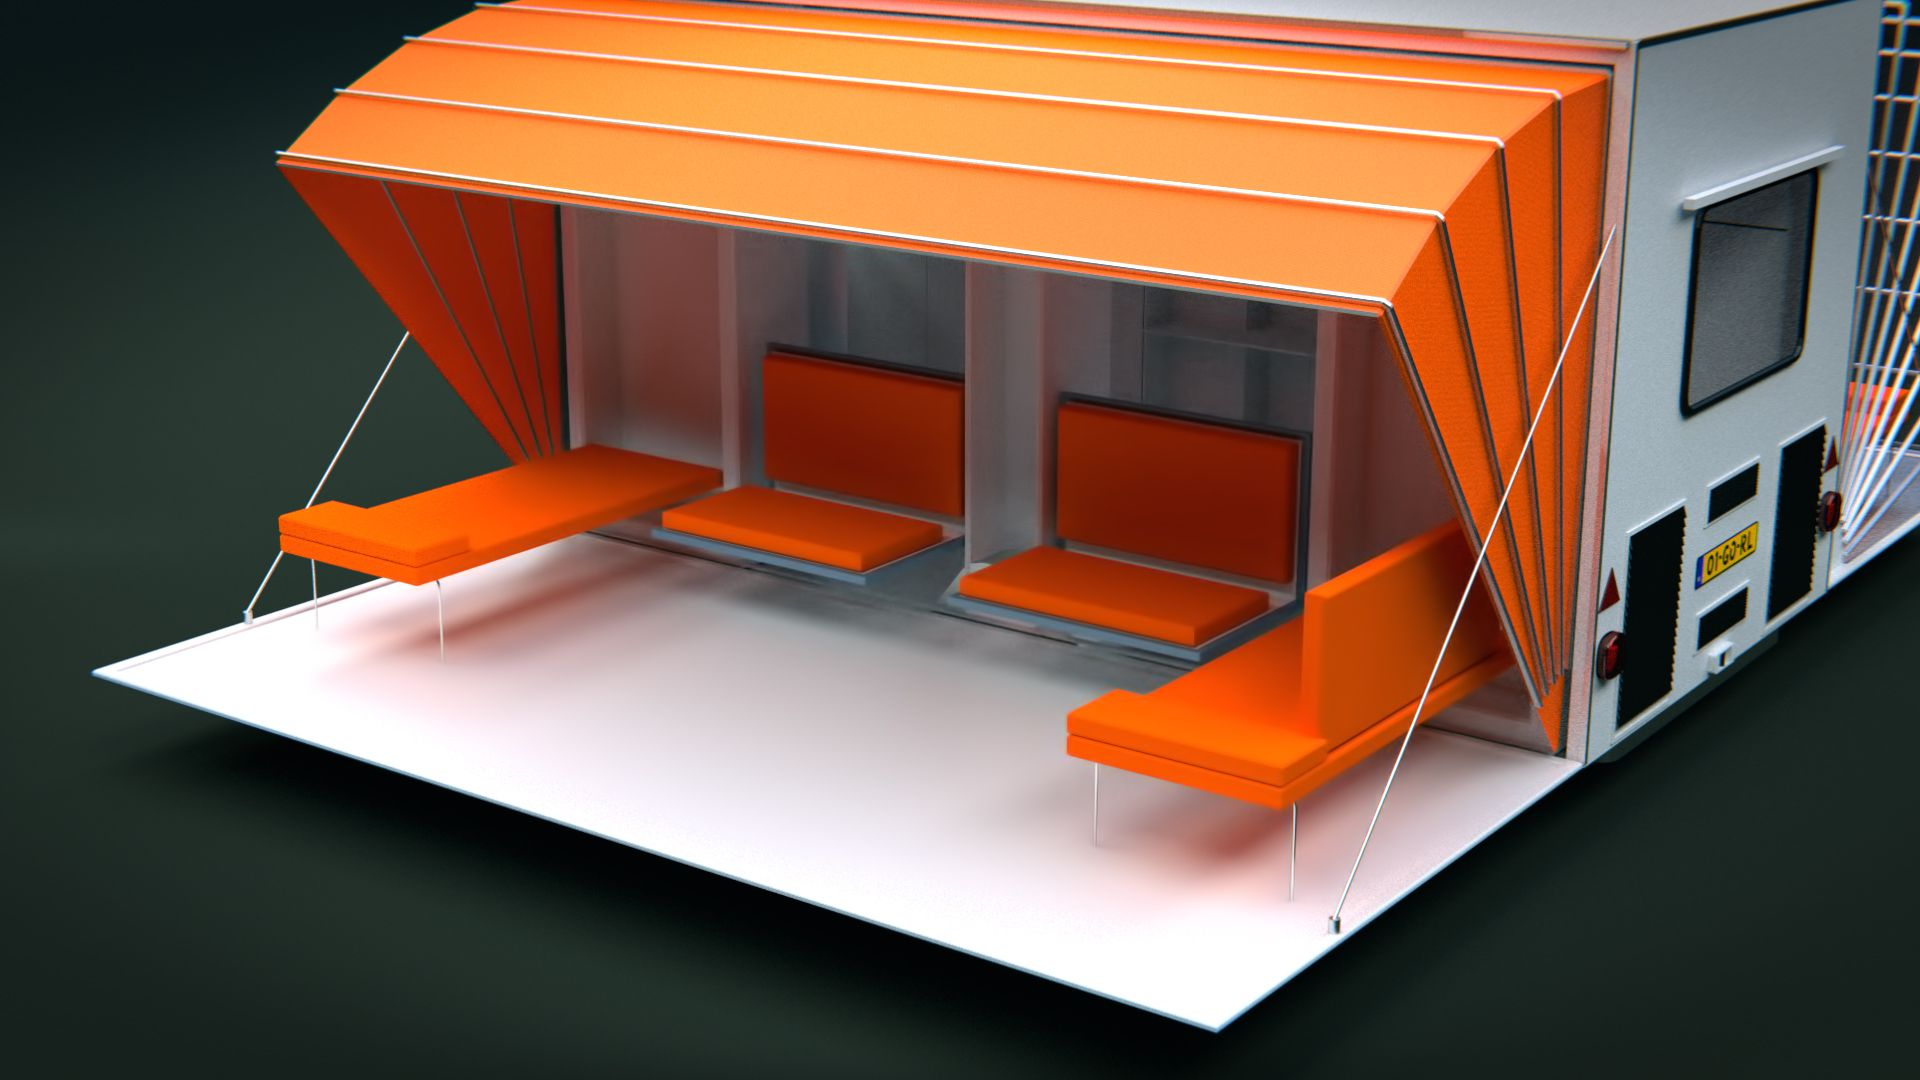 Benjamin sohn product design compositing 3d de for Mobile home designer